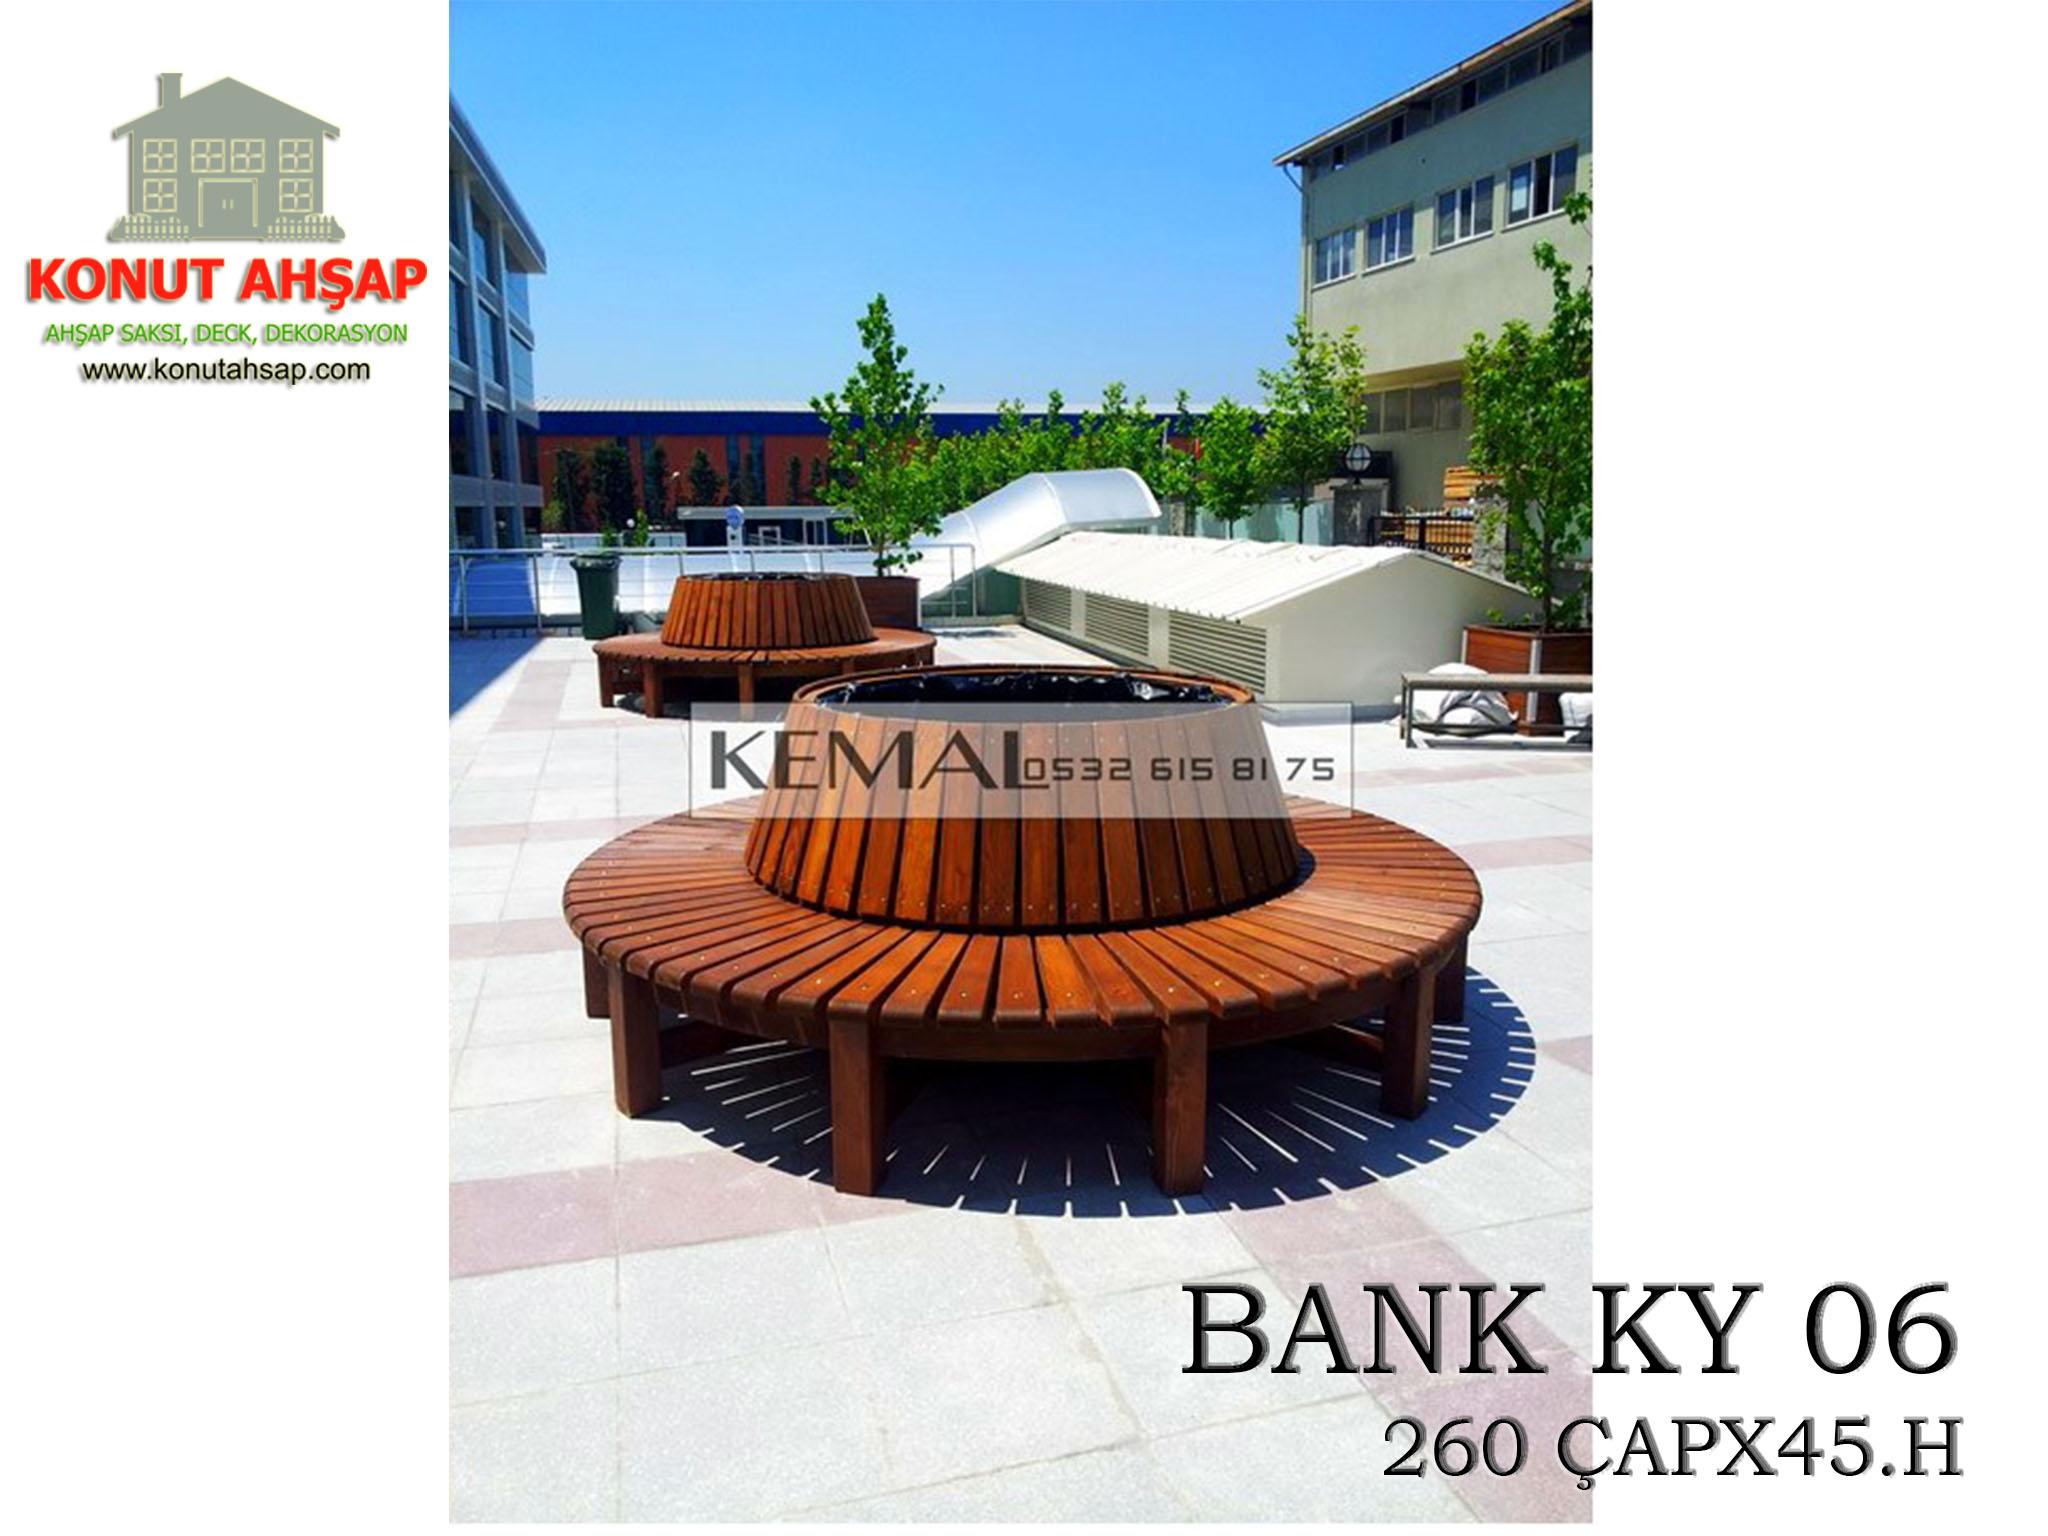 BANK KY 06